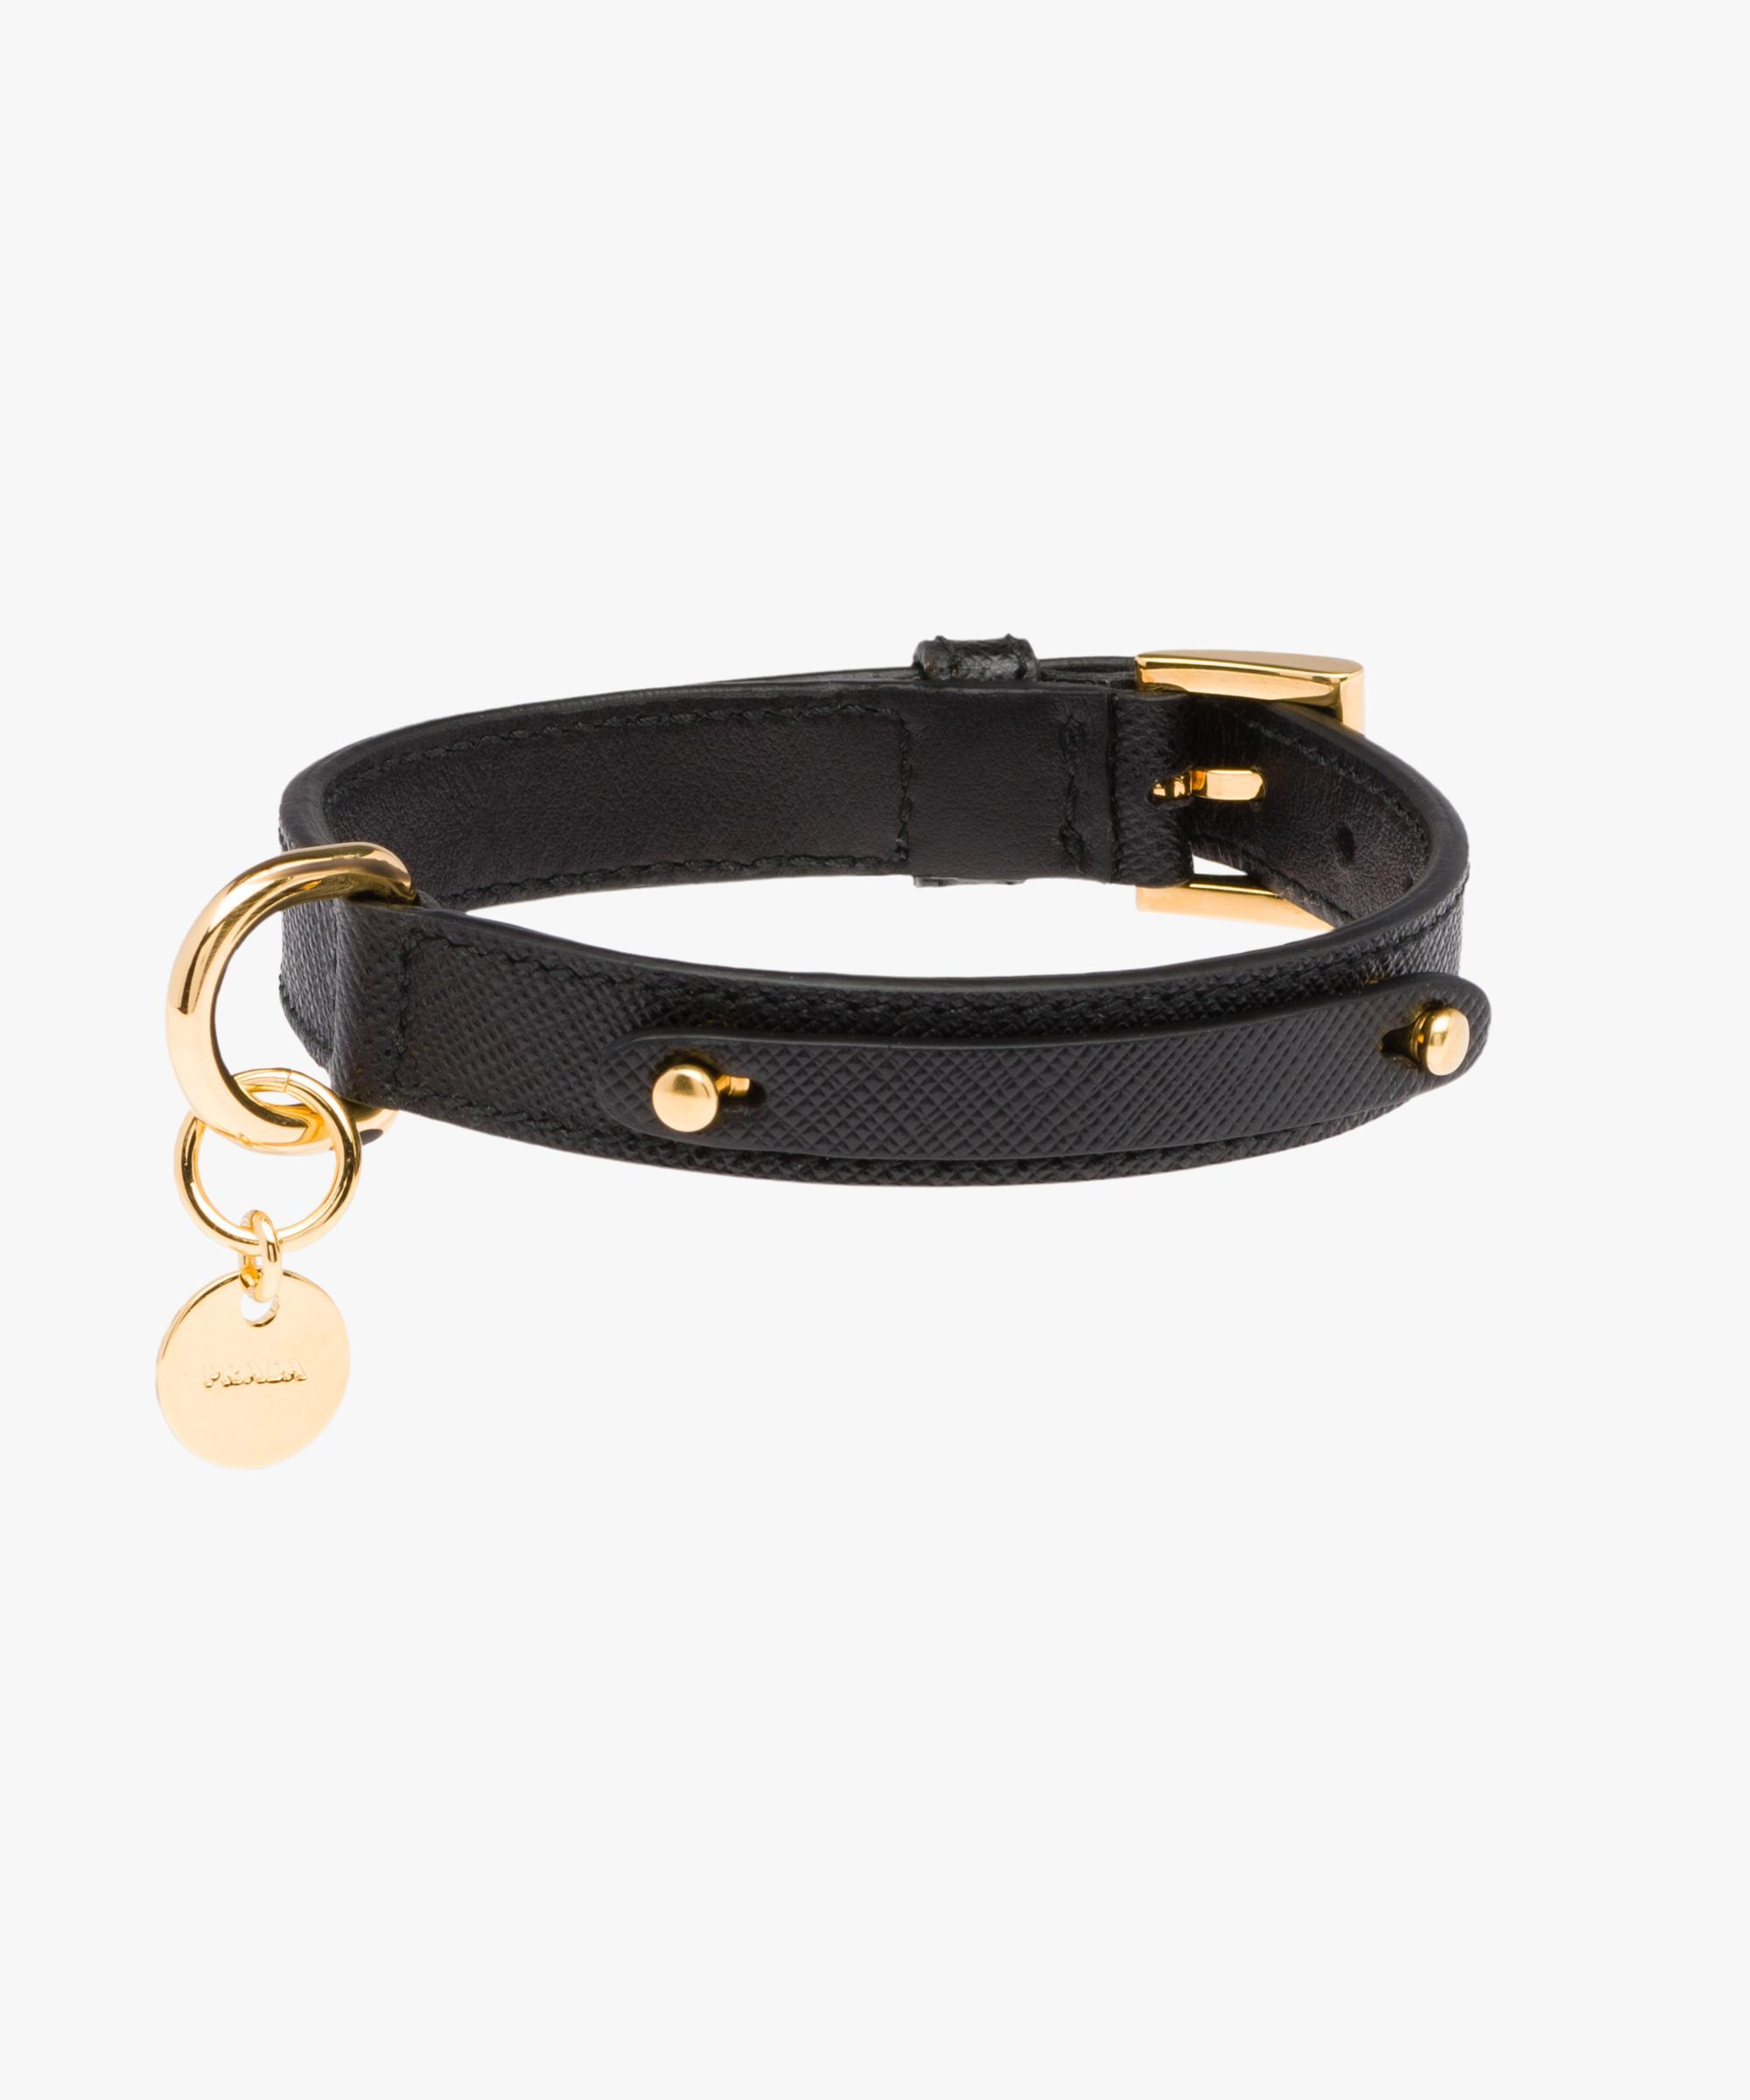 abc869d7aa5a1 Prada Black Saffiano Leather Dog Collar